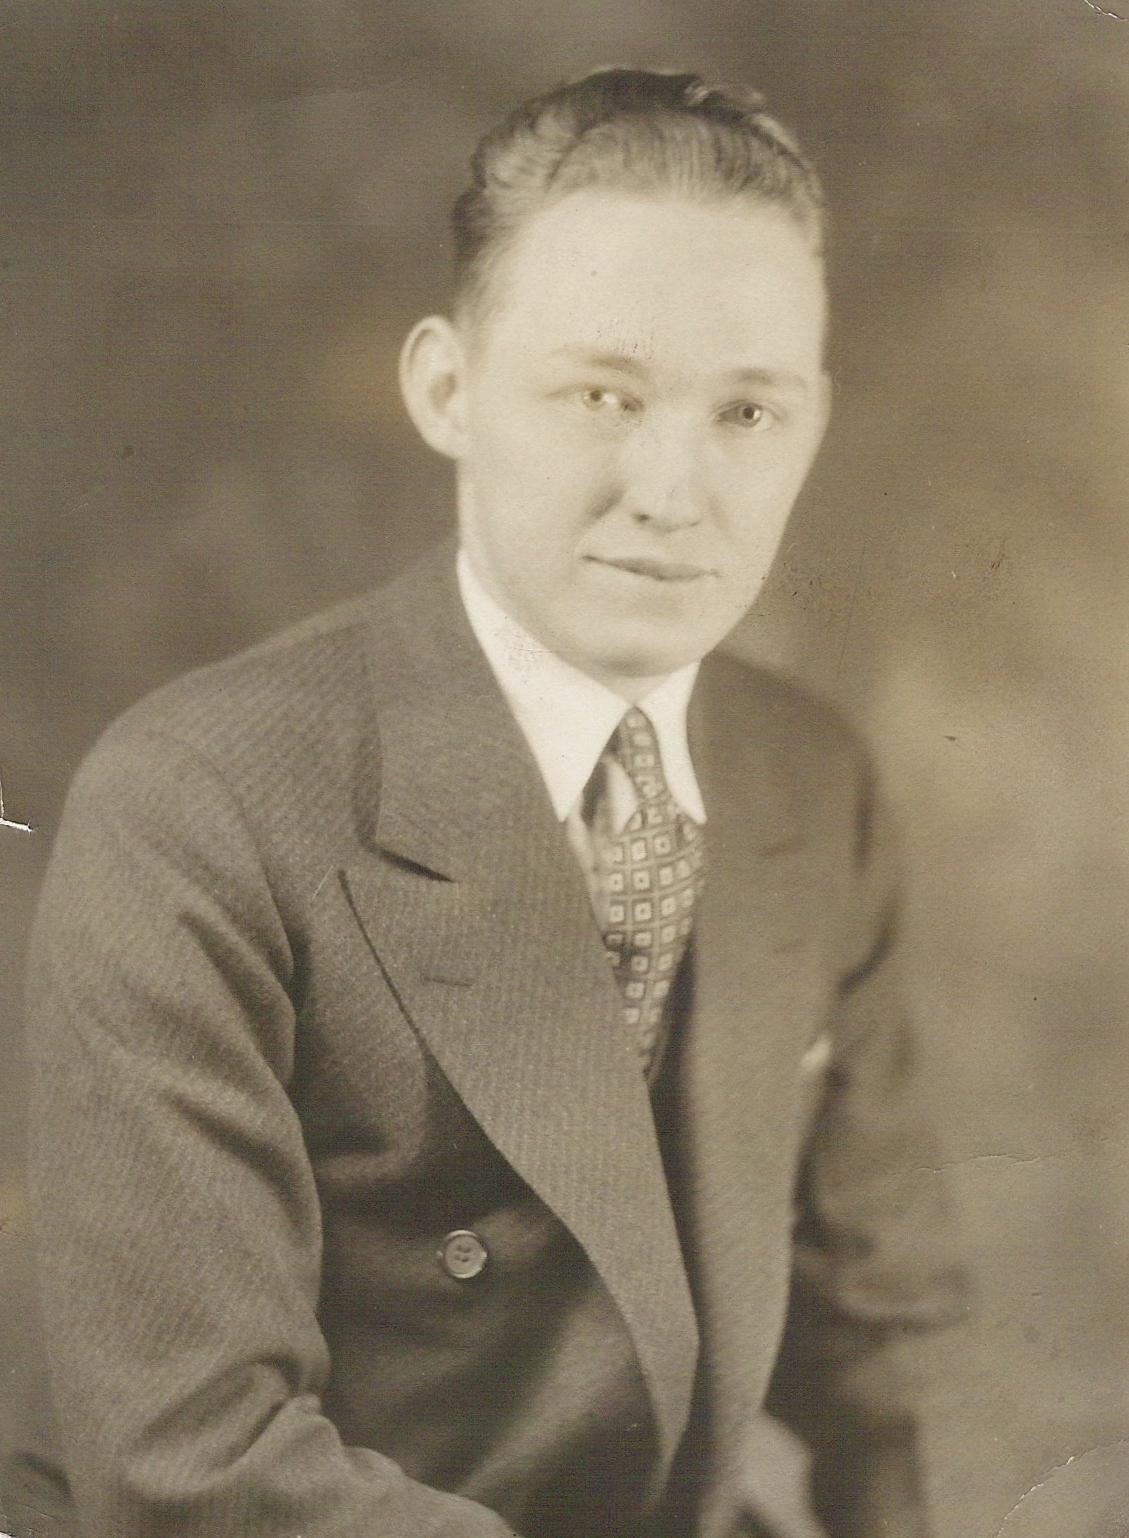 Anderson, George Alton